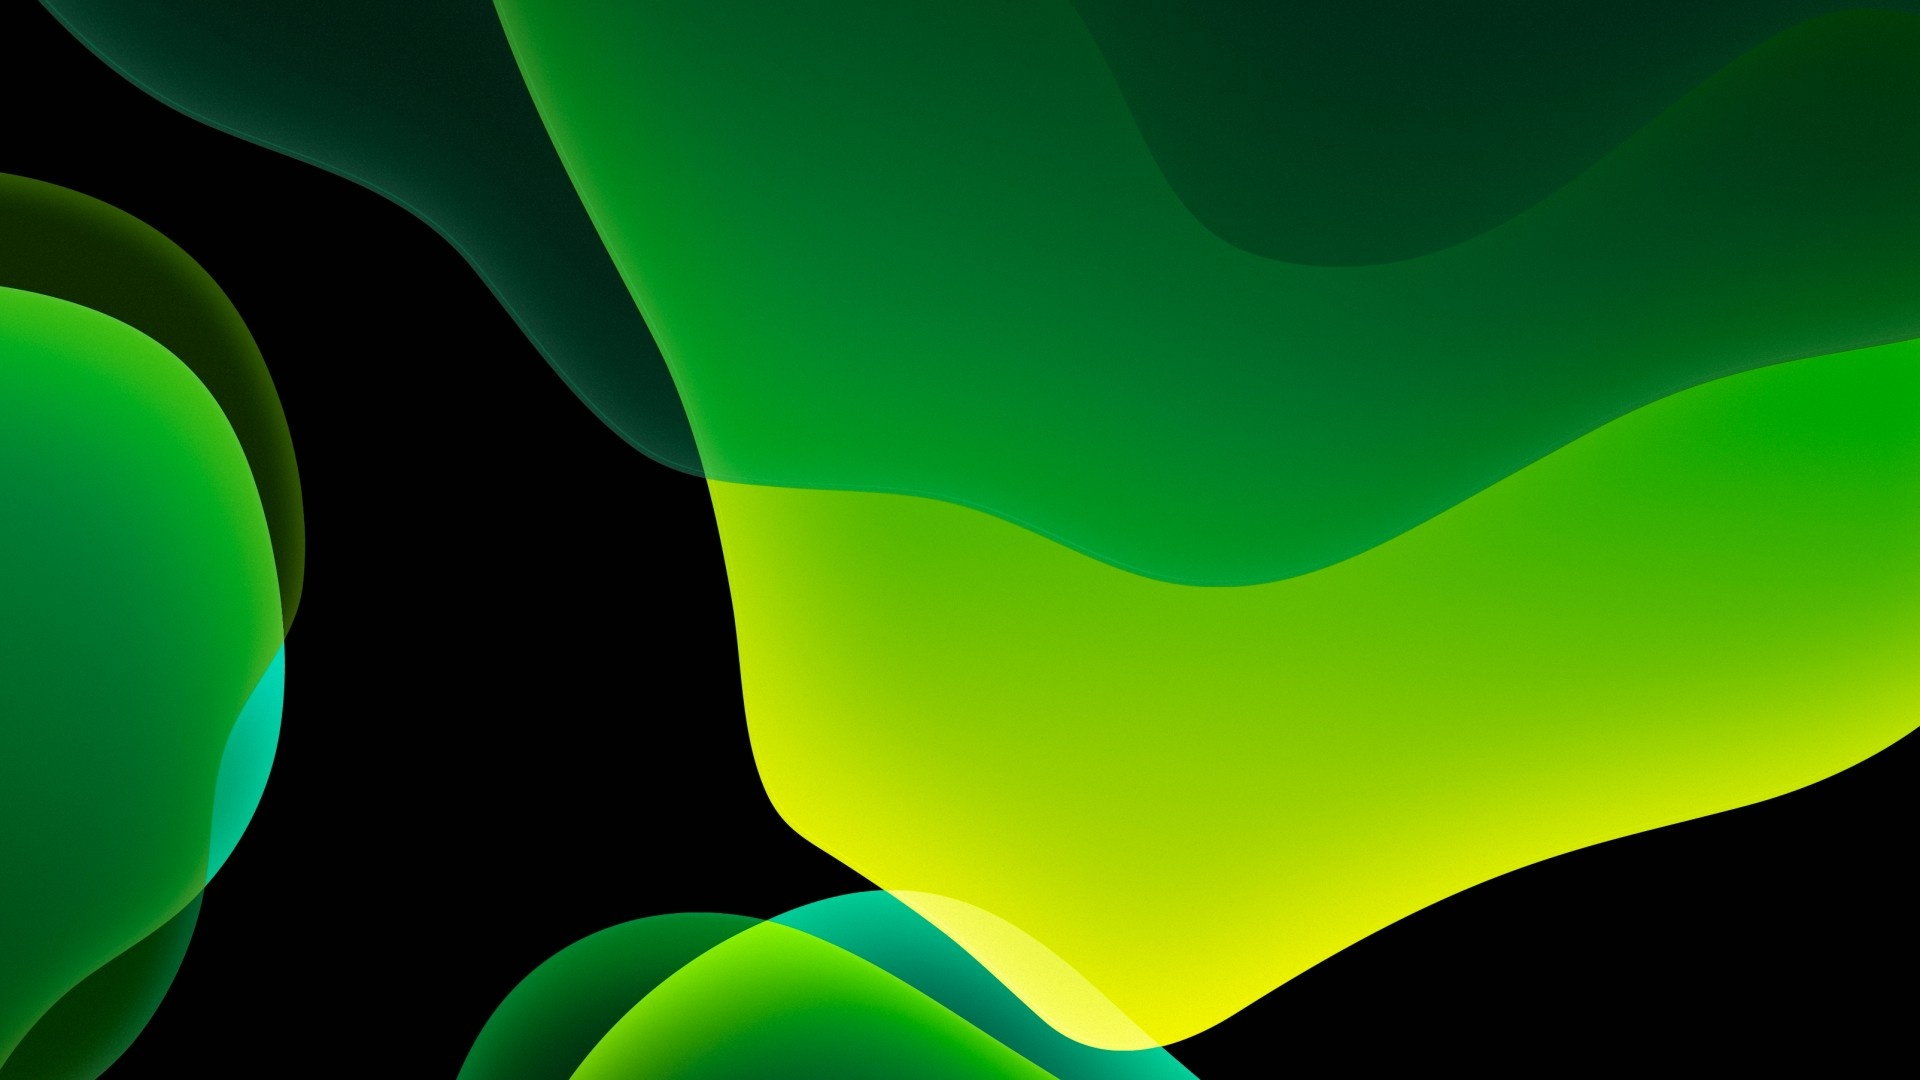 Ios 13 Liquid desktop wallpaper free download